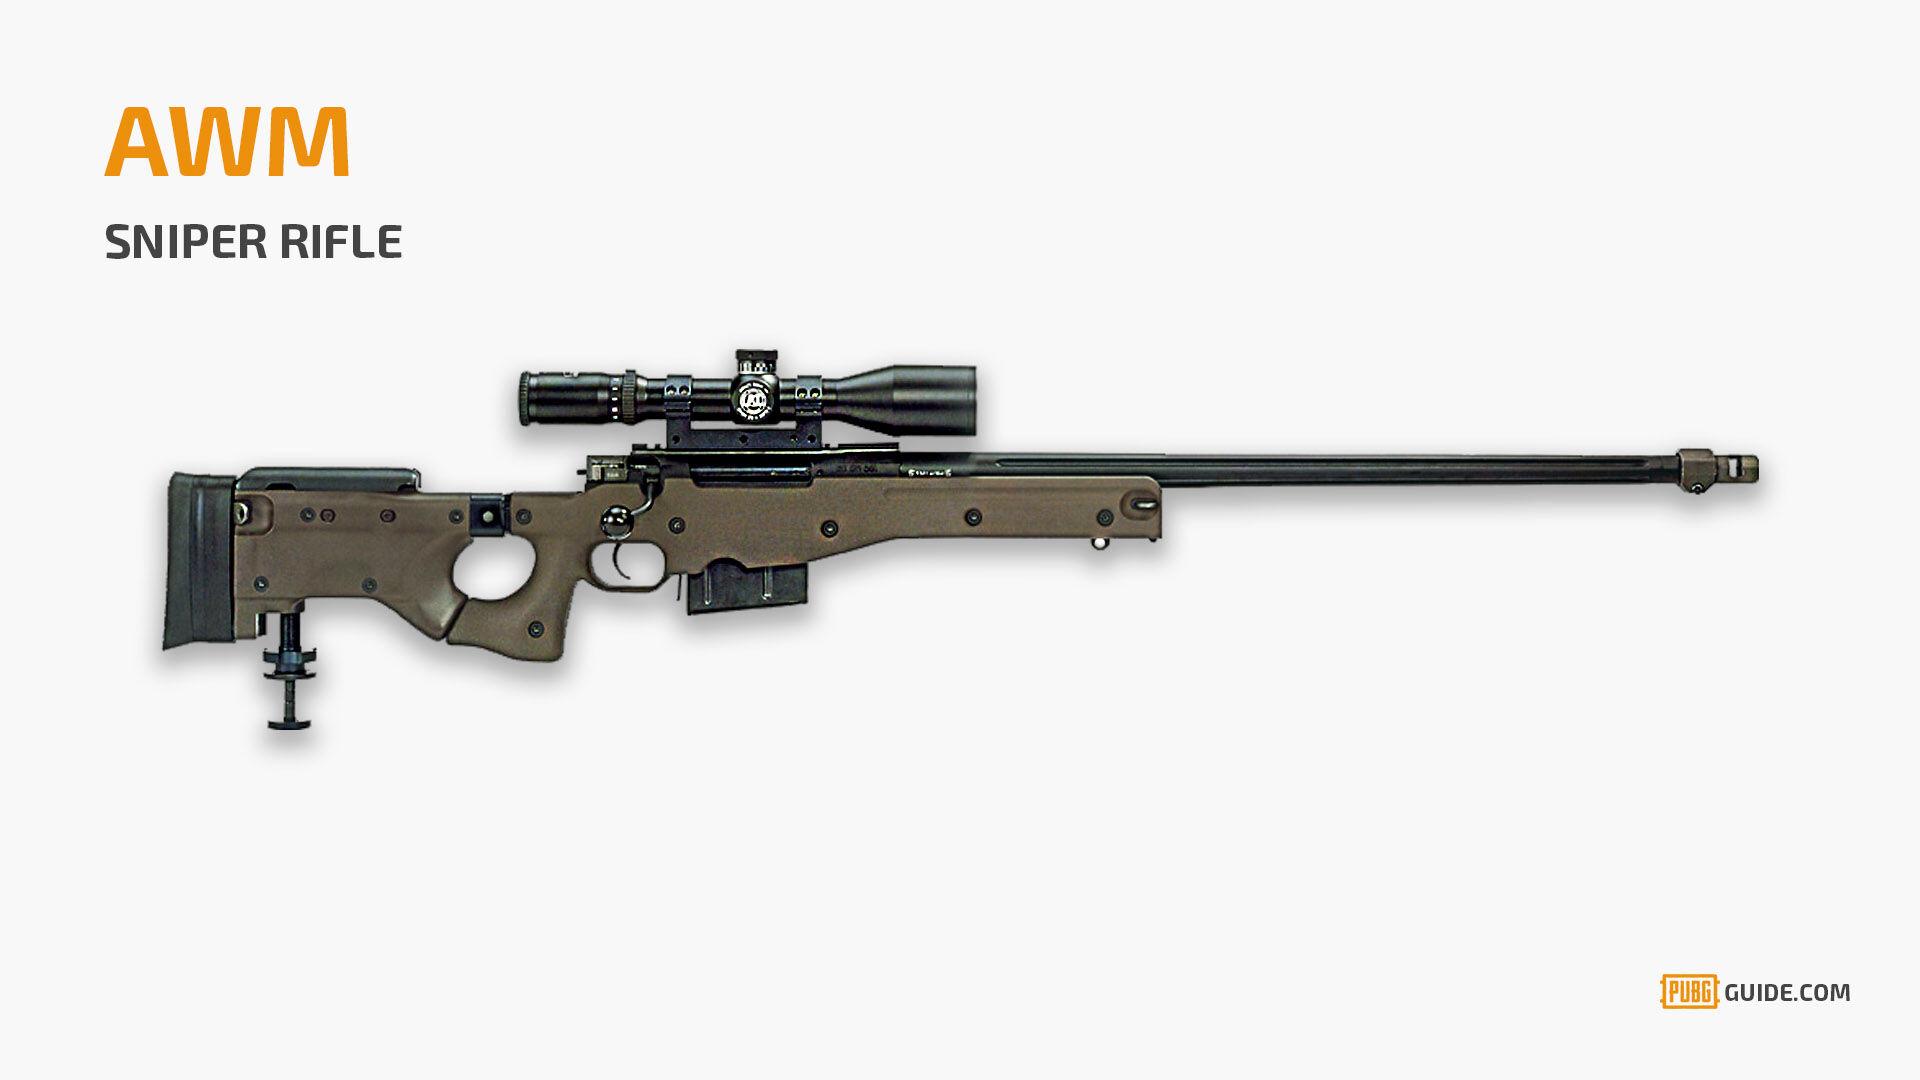 Pubg Weapon AWM 1 194f5